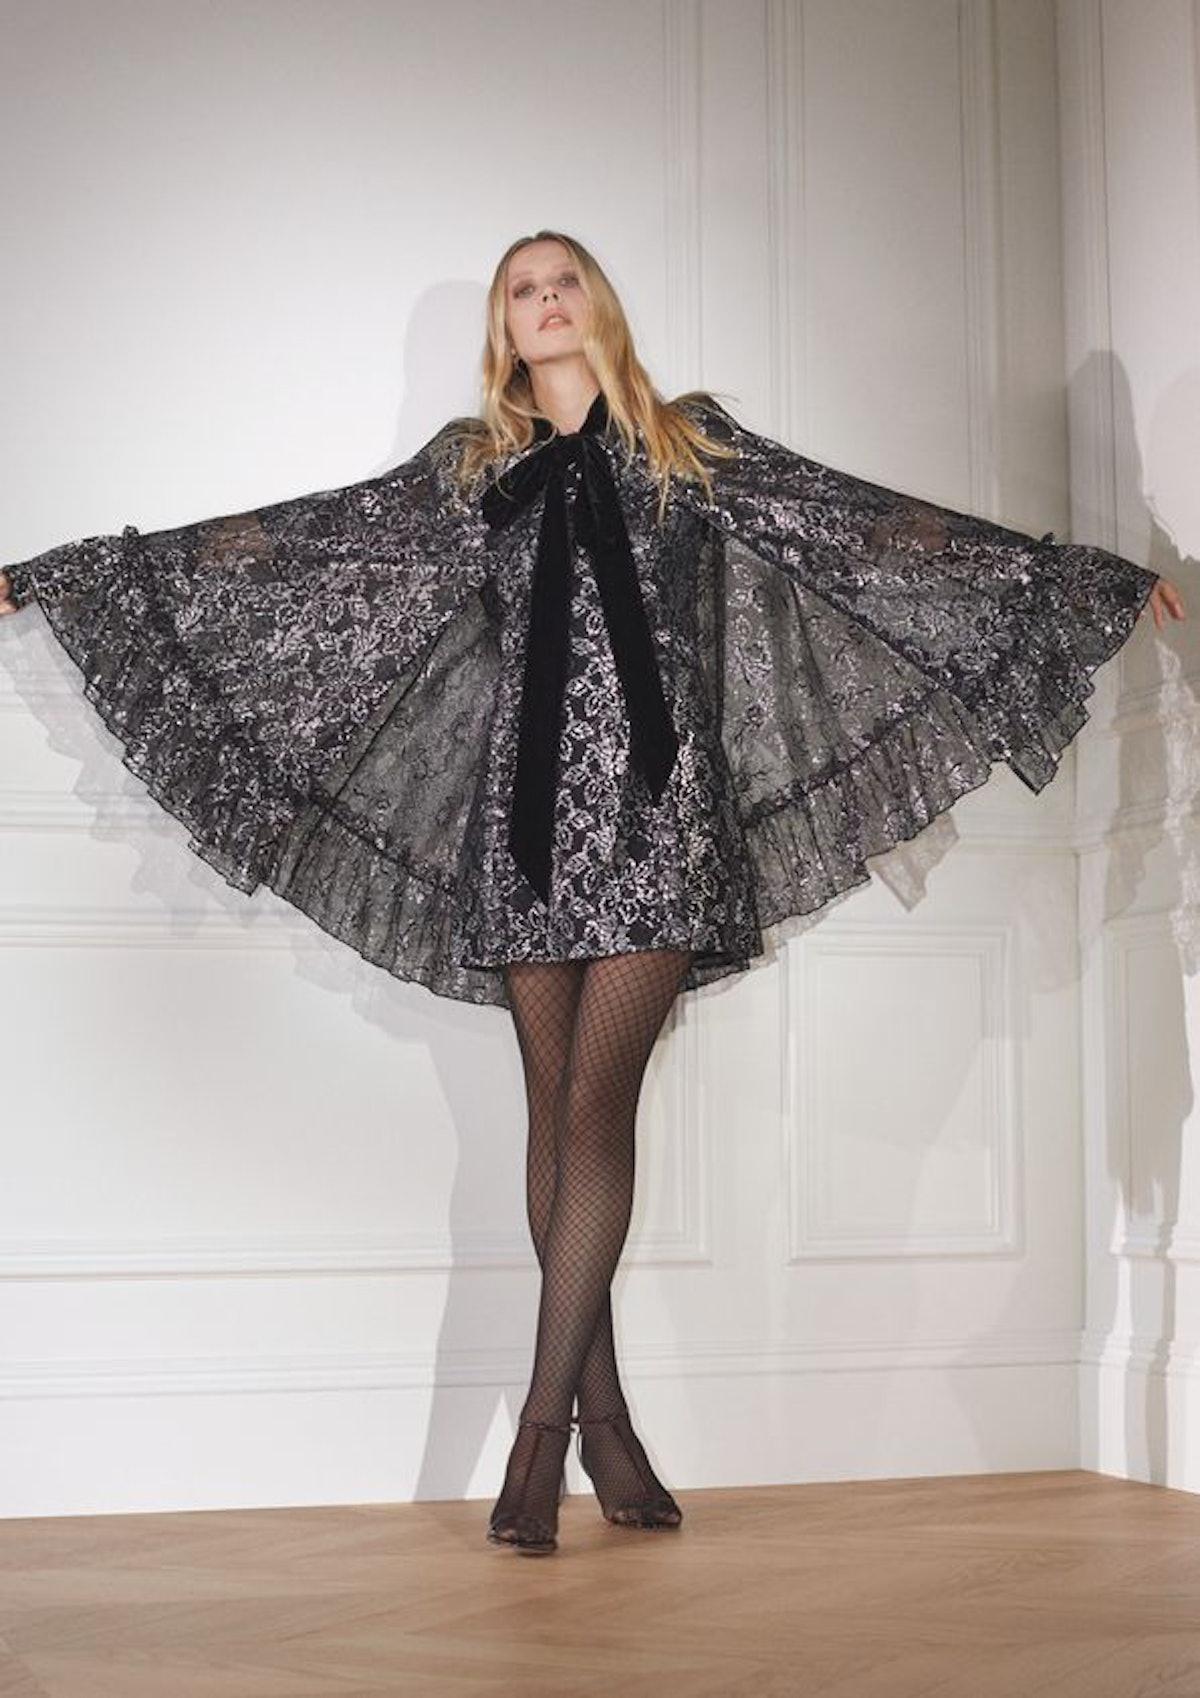 H&M x the Vampire's Wife Silver Lace Cape